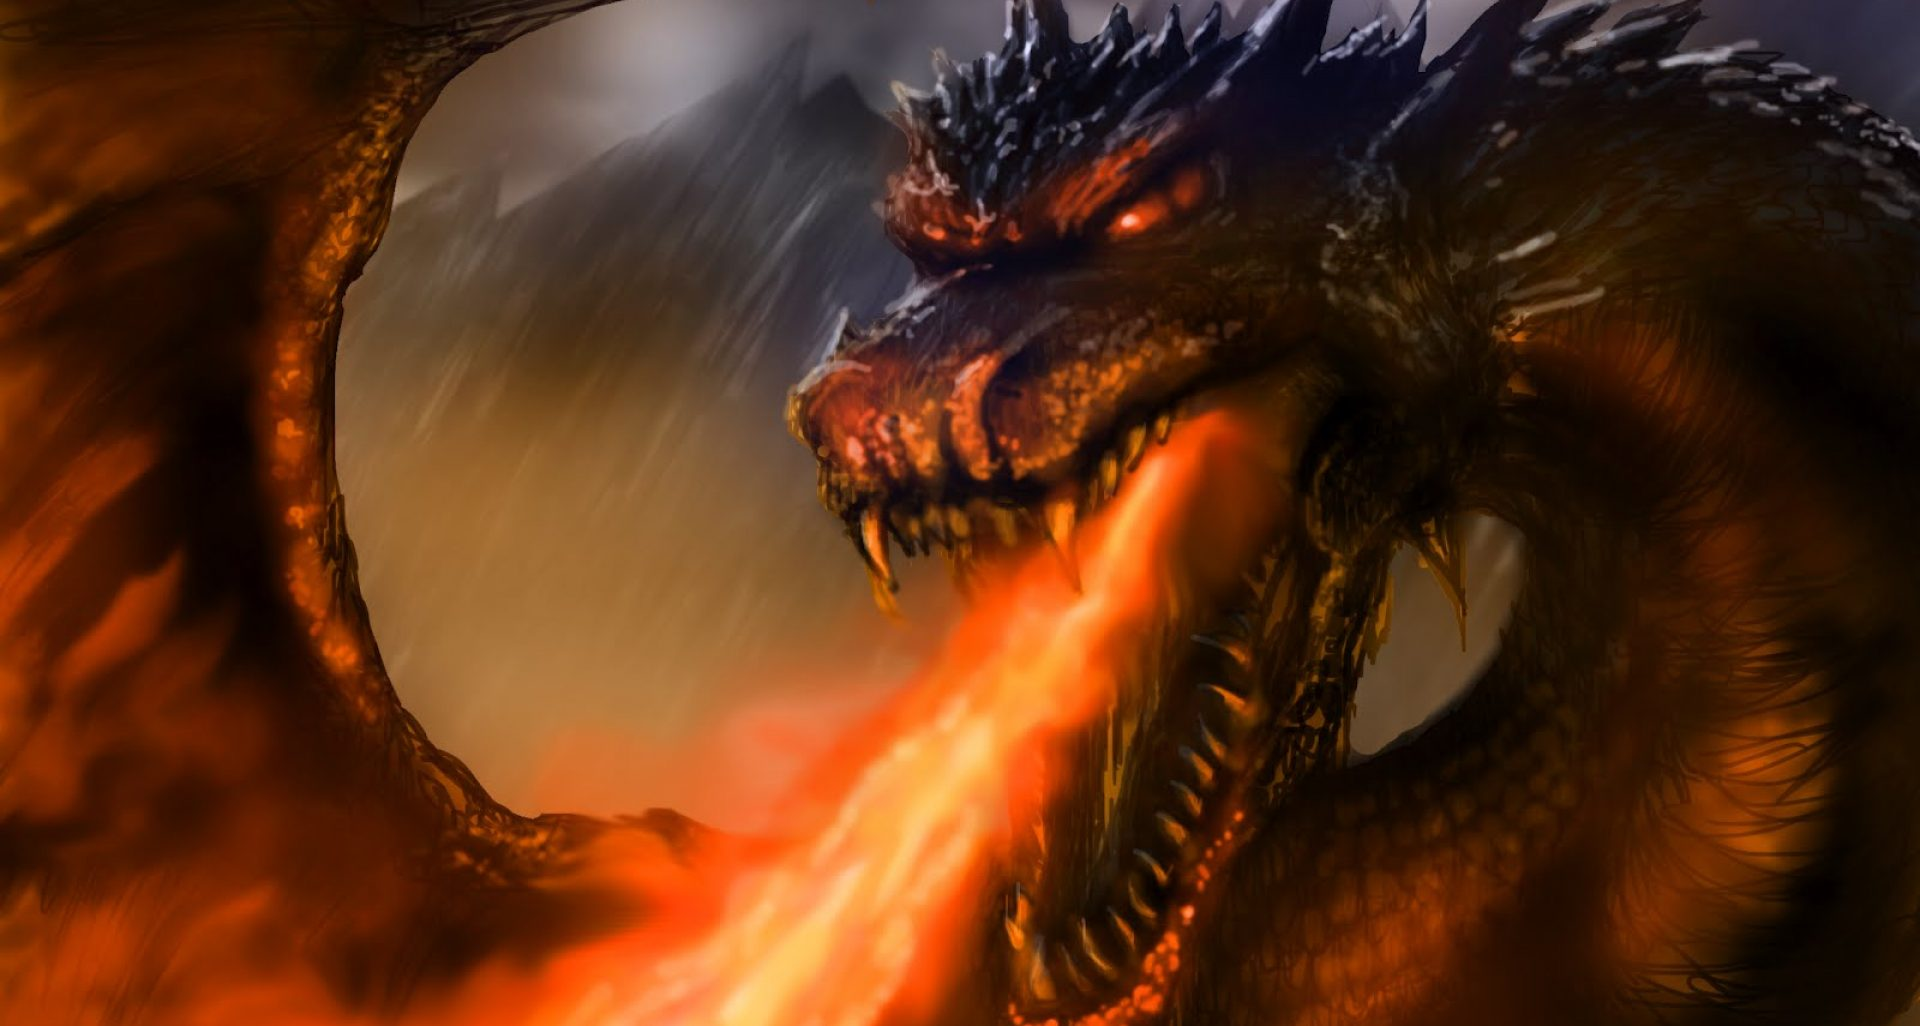 cropped-5a916-dragon_of_flames_by_elegantartist21-d4pya6u.jpg